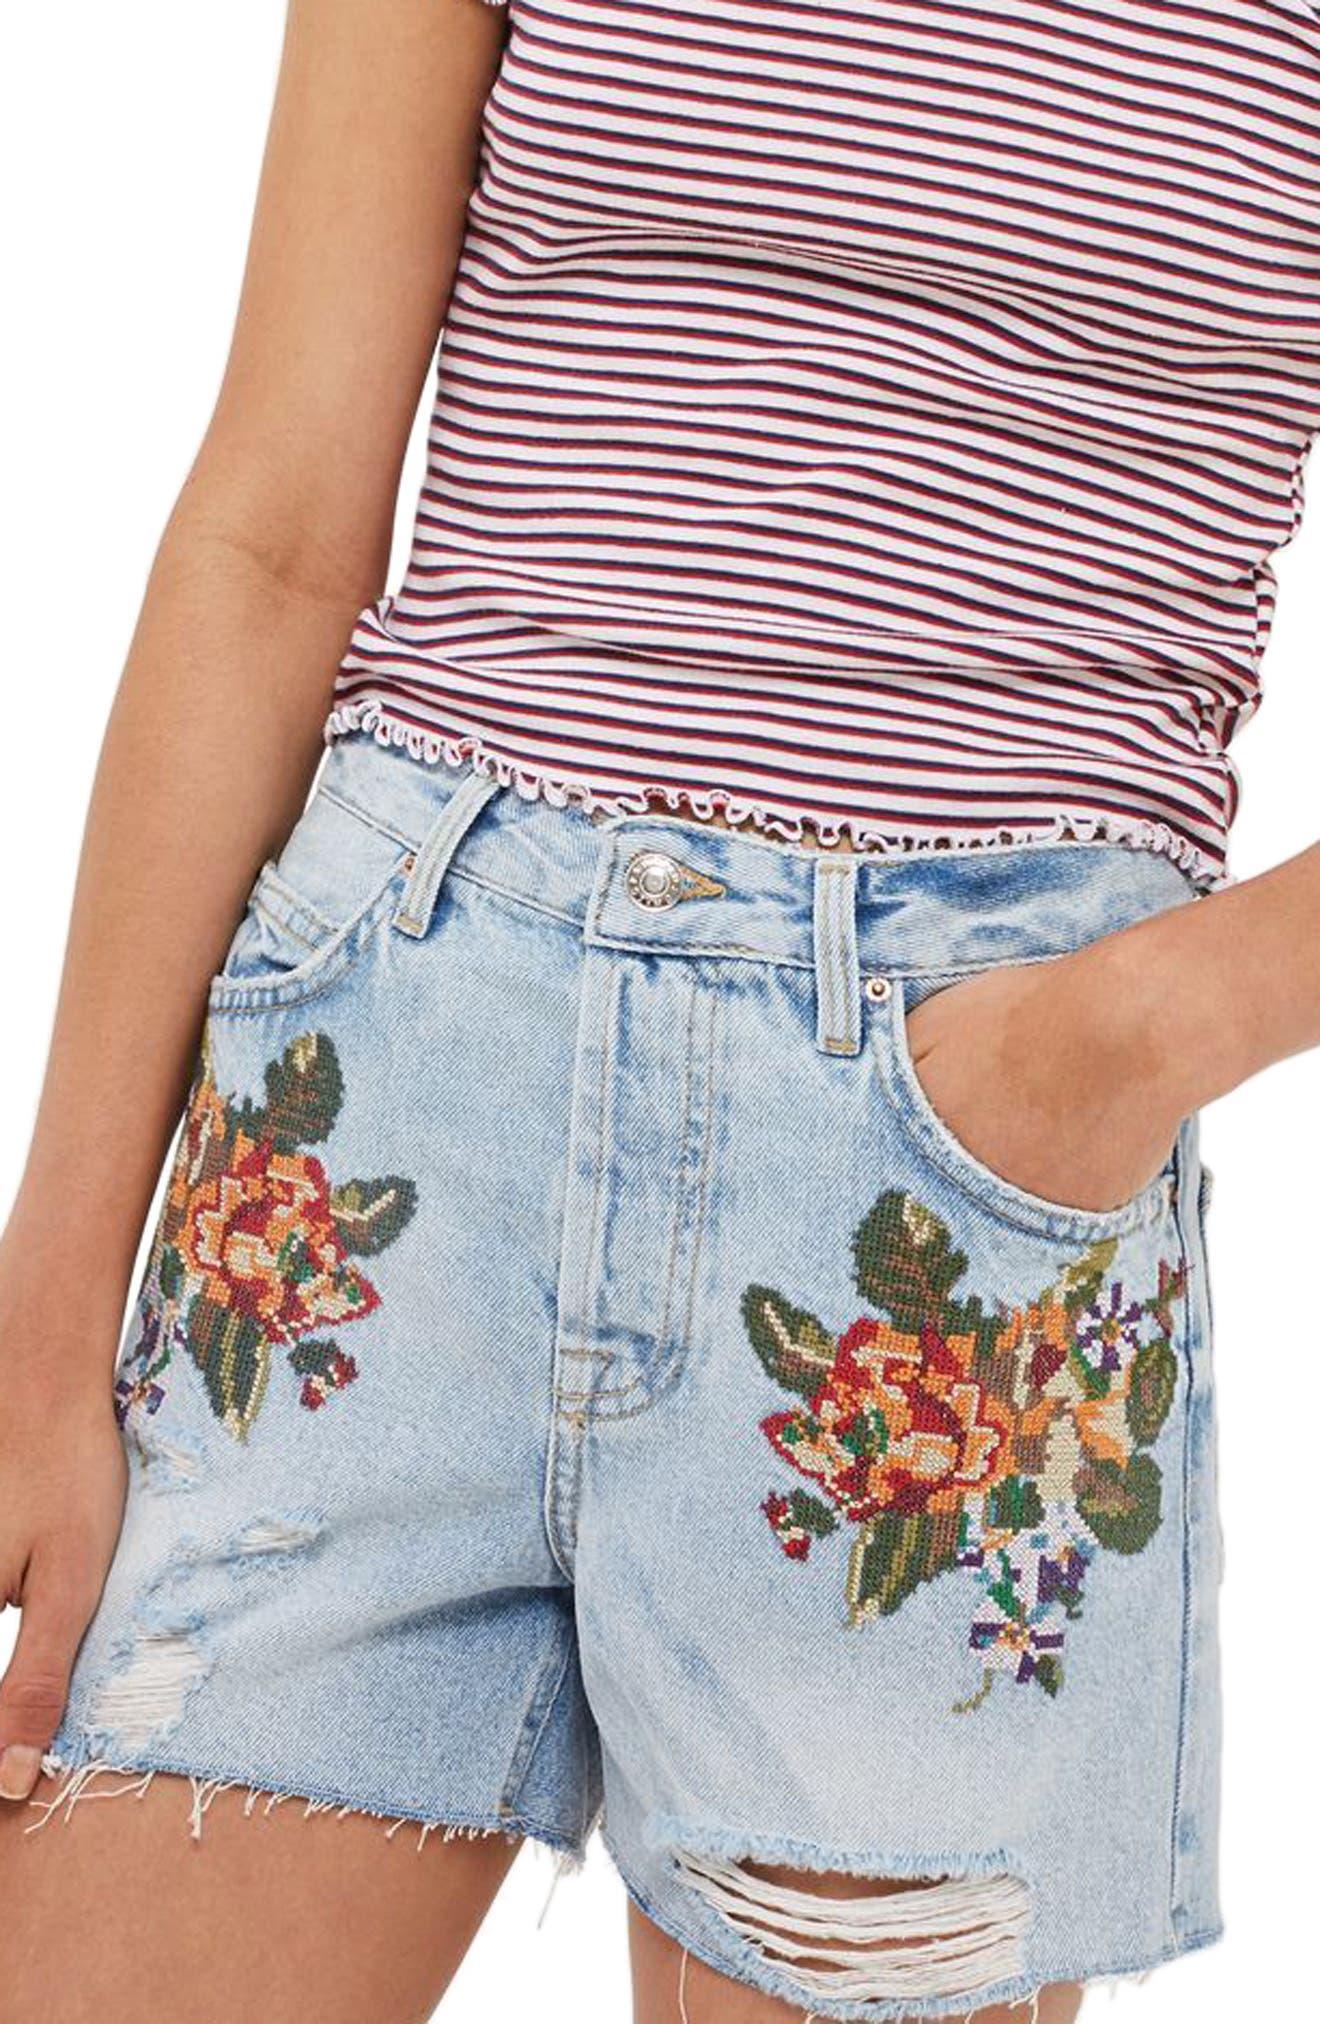 TOPSHOP Ashley Cross Stitch Vintage Floral Denim Shorts